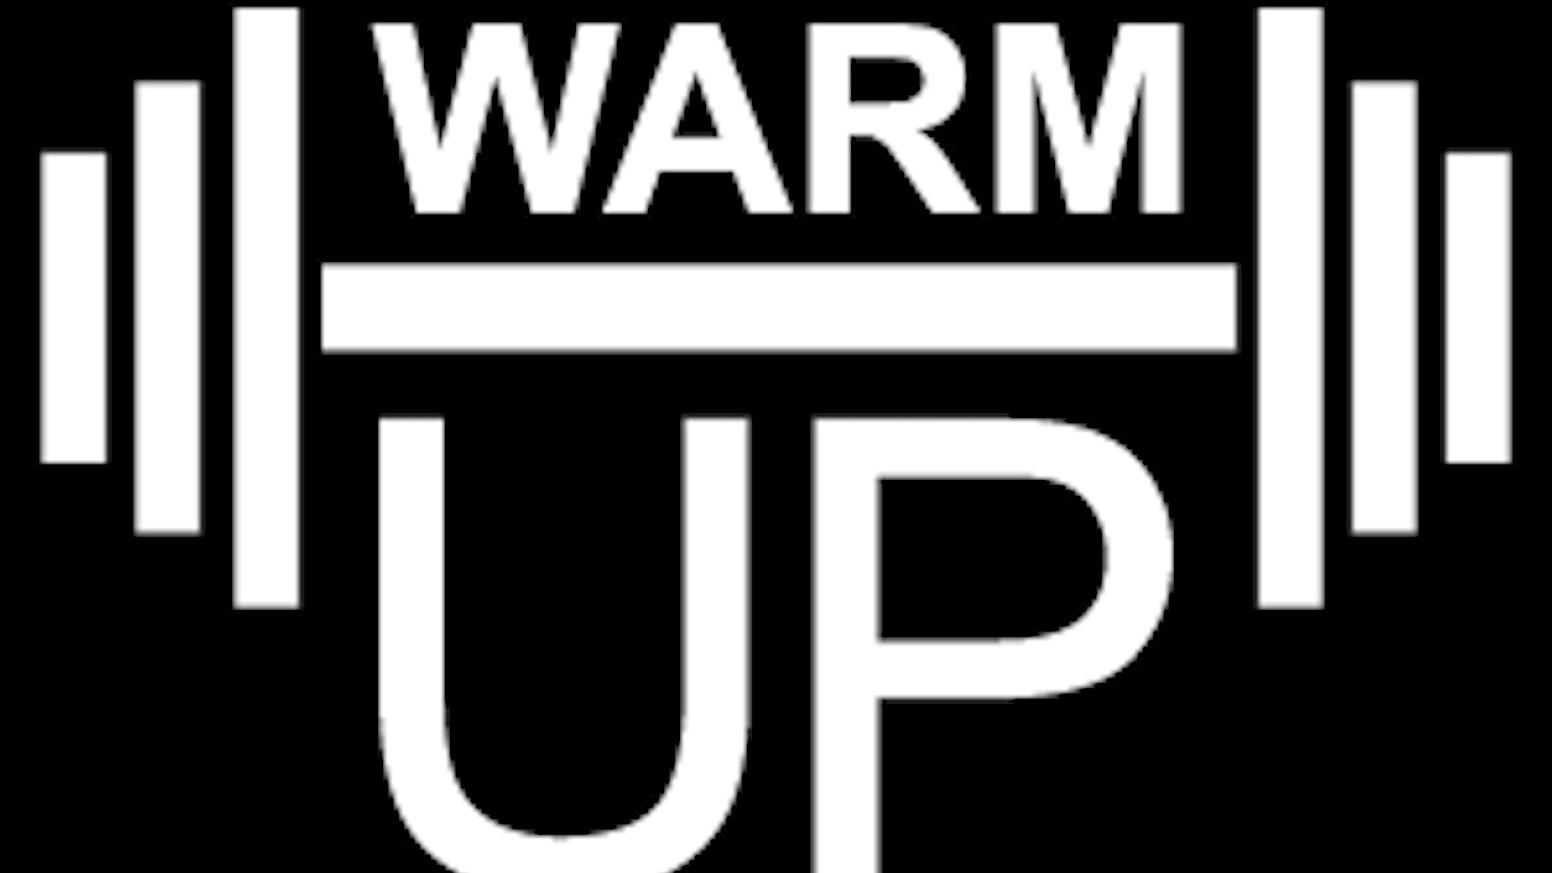 WarmUp: A High-Protein Coffee by James Testa — Kickstarter